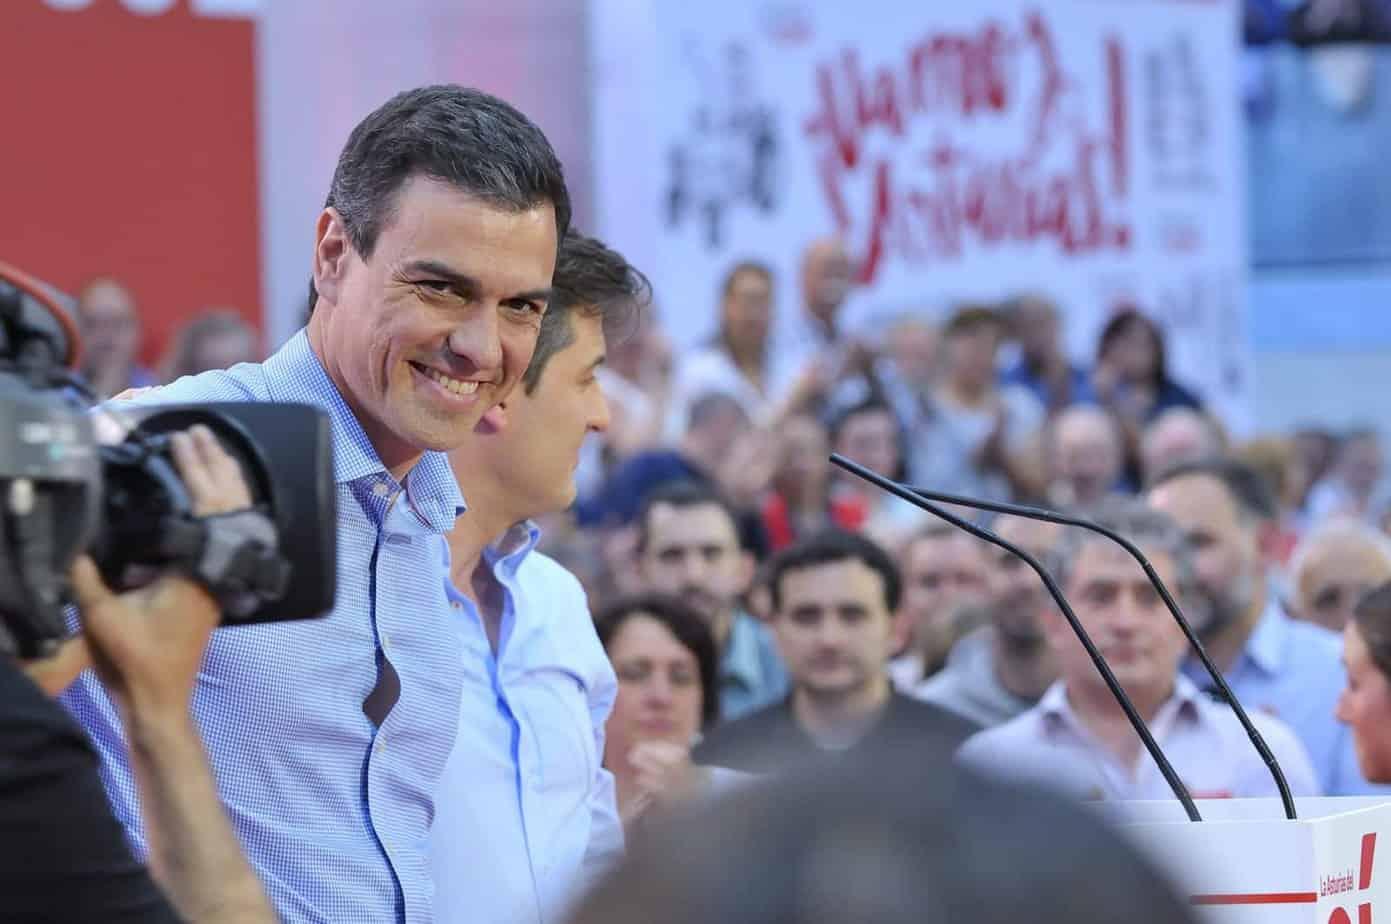 Make Spain (and Europe) Great Again